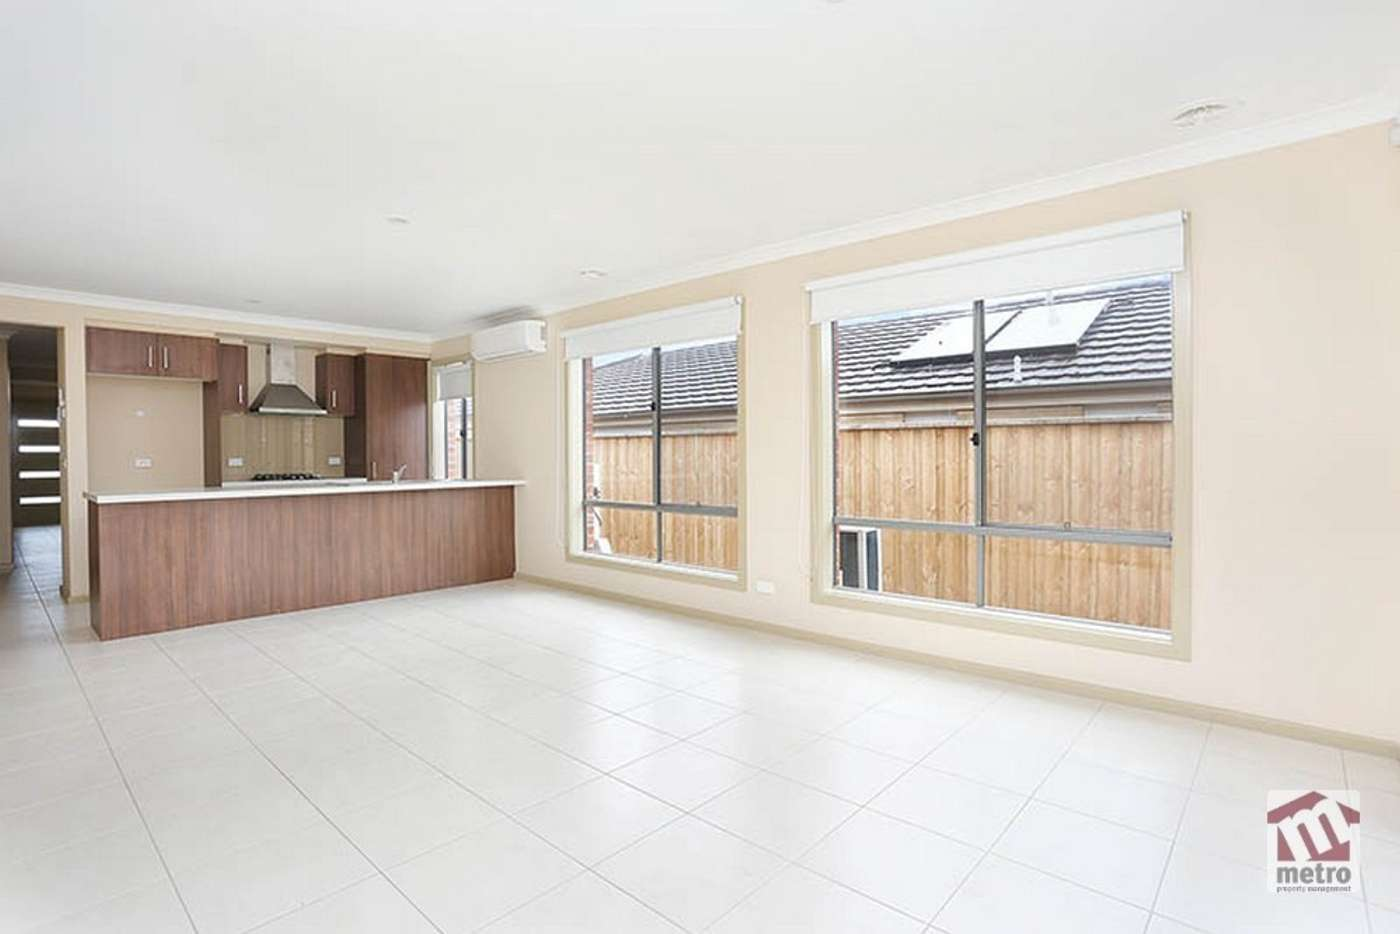 Main view of Homely house listing, 22 Sackville Street, Mernda VIC 3754